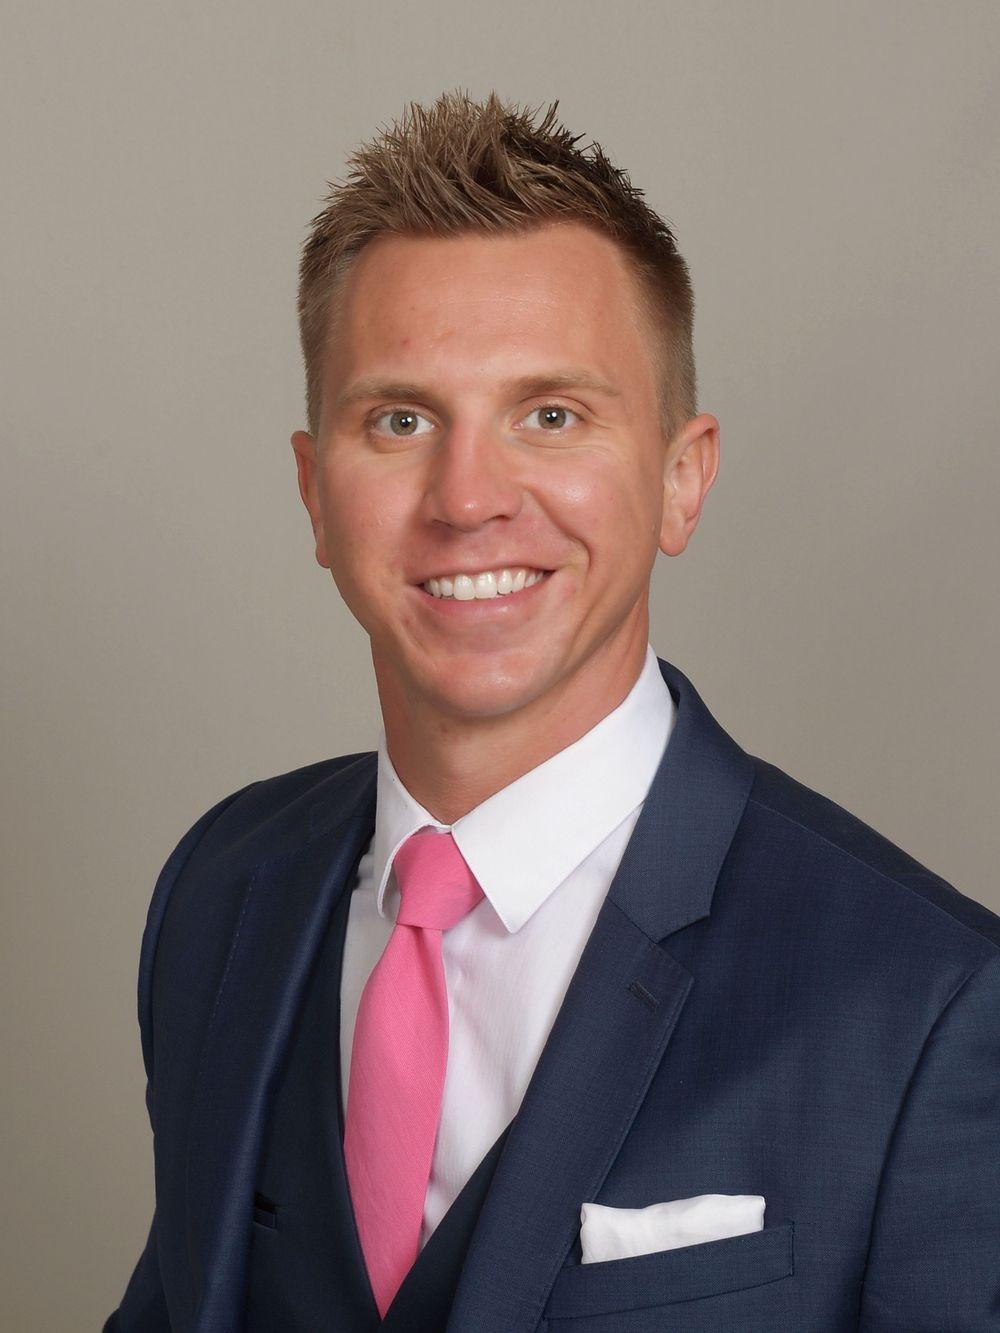 Tulsa Attorney, Isaiah Parsons